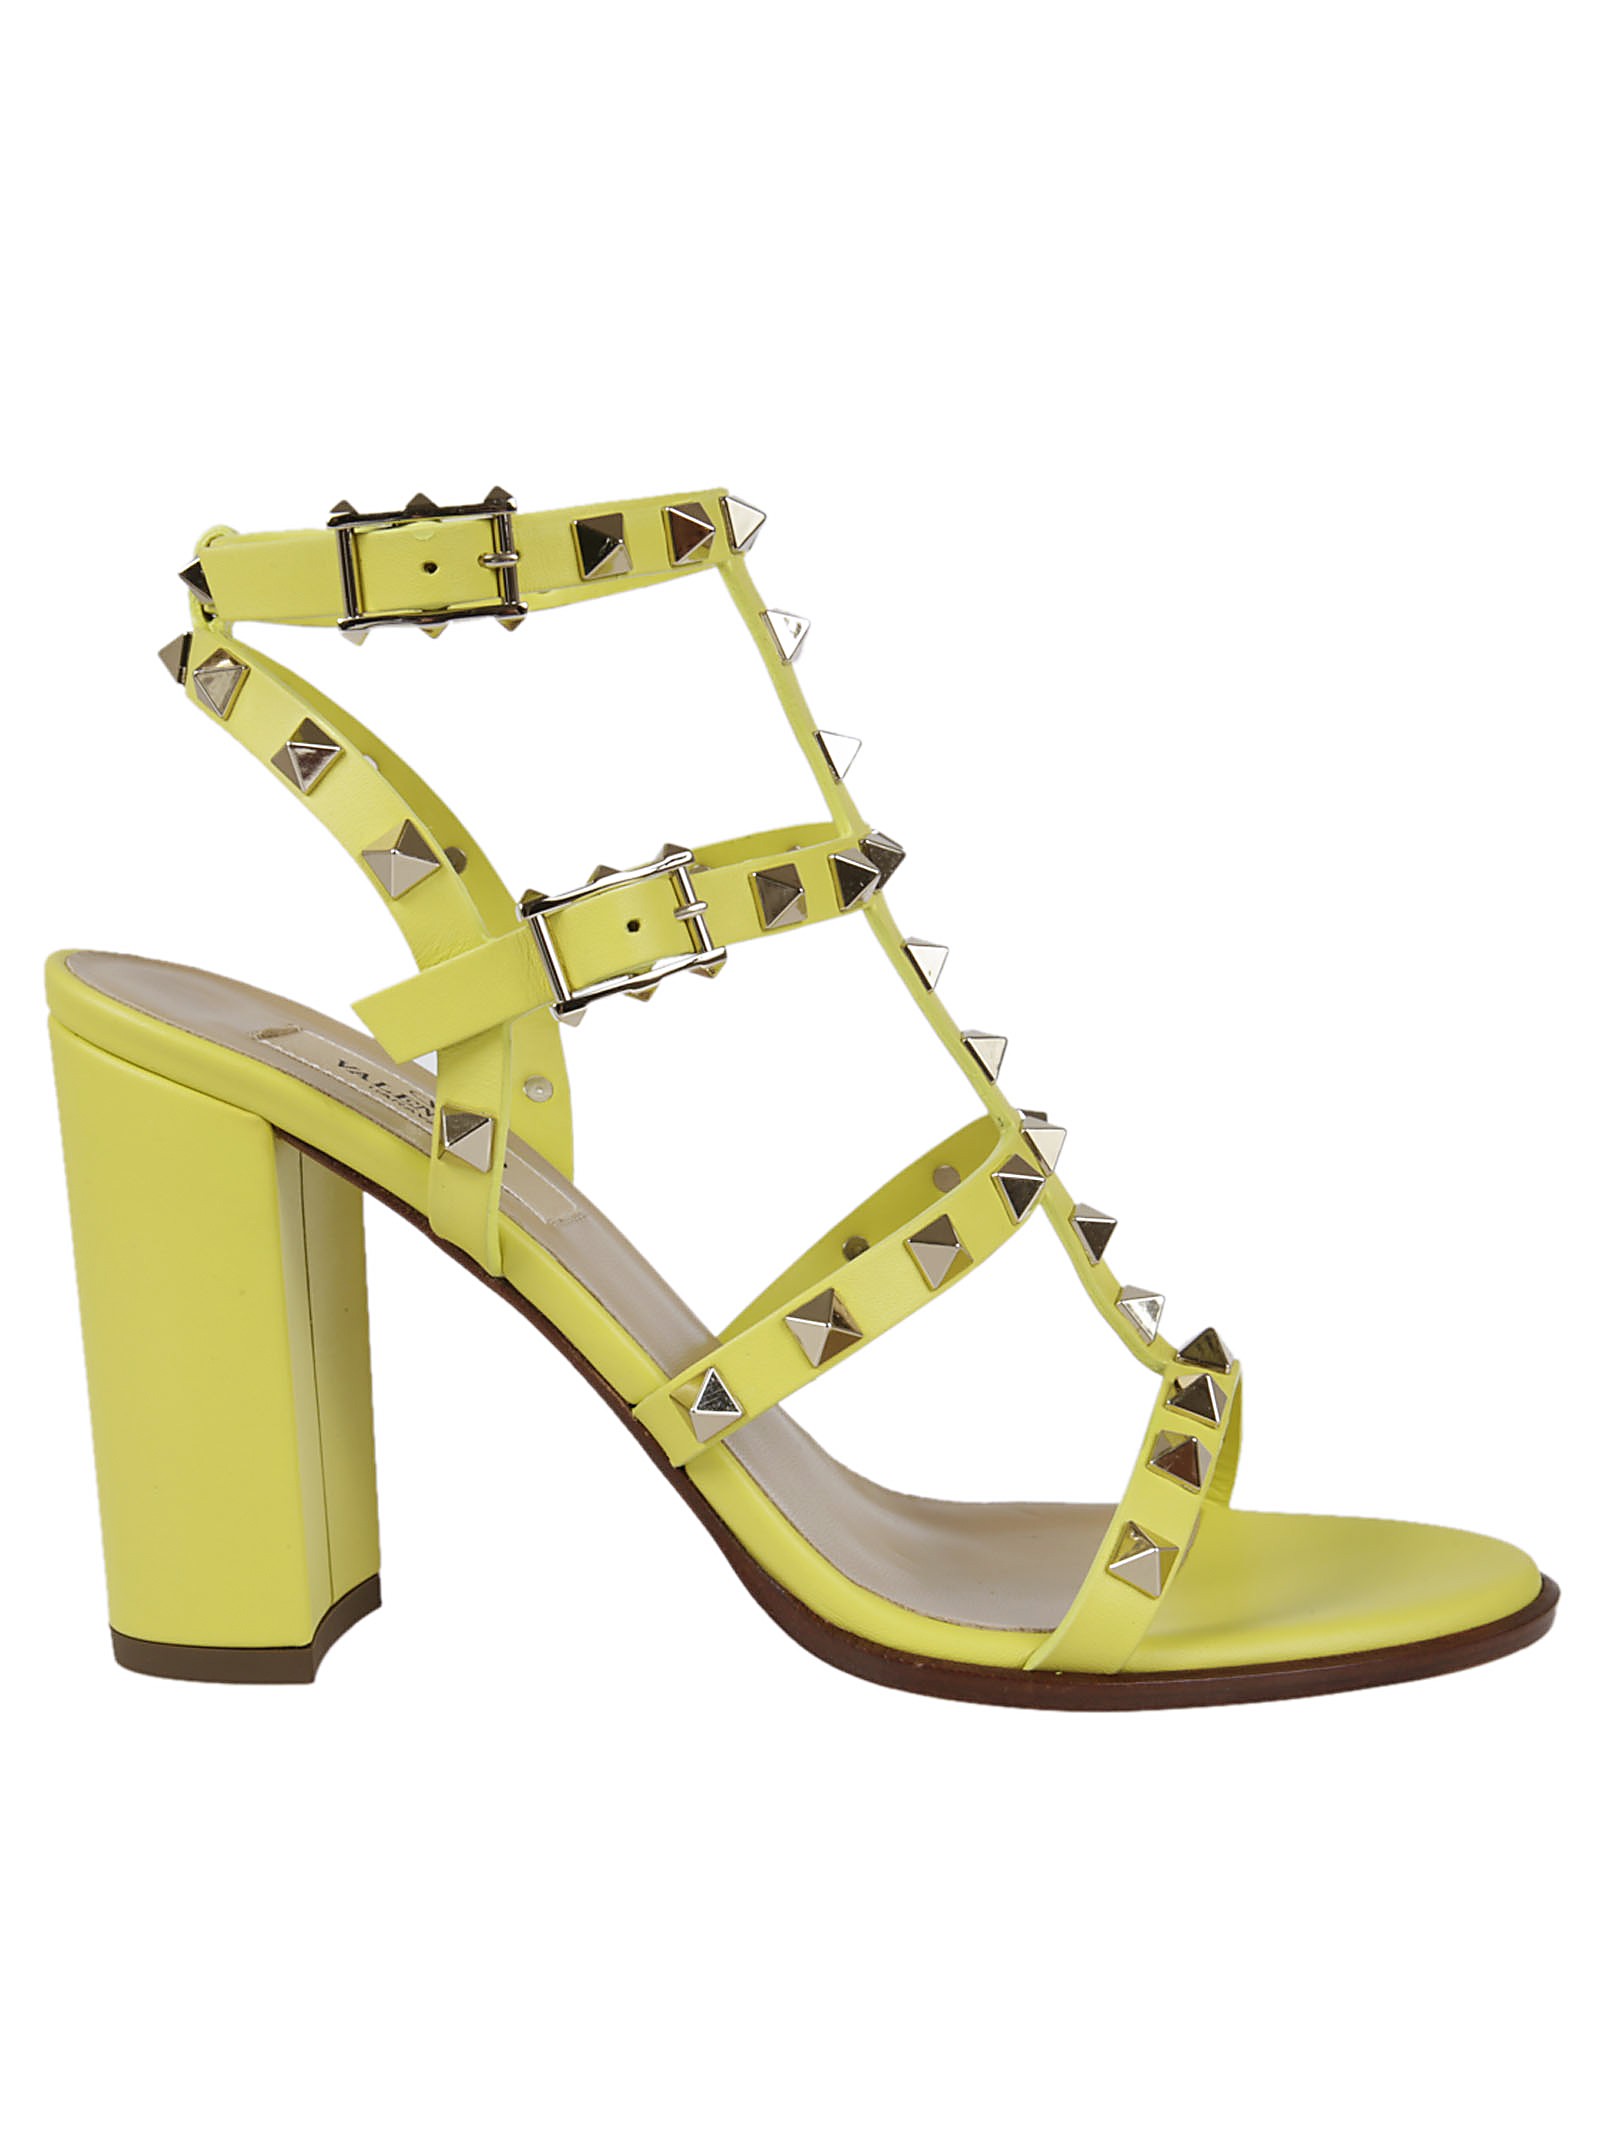 Valentino Garavani Valentino Garavani Rockstud Sandals